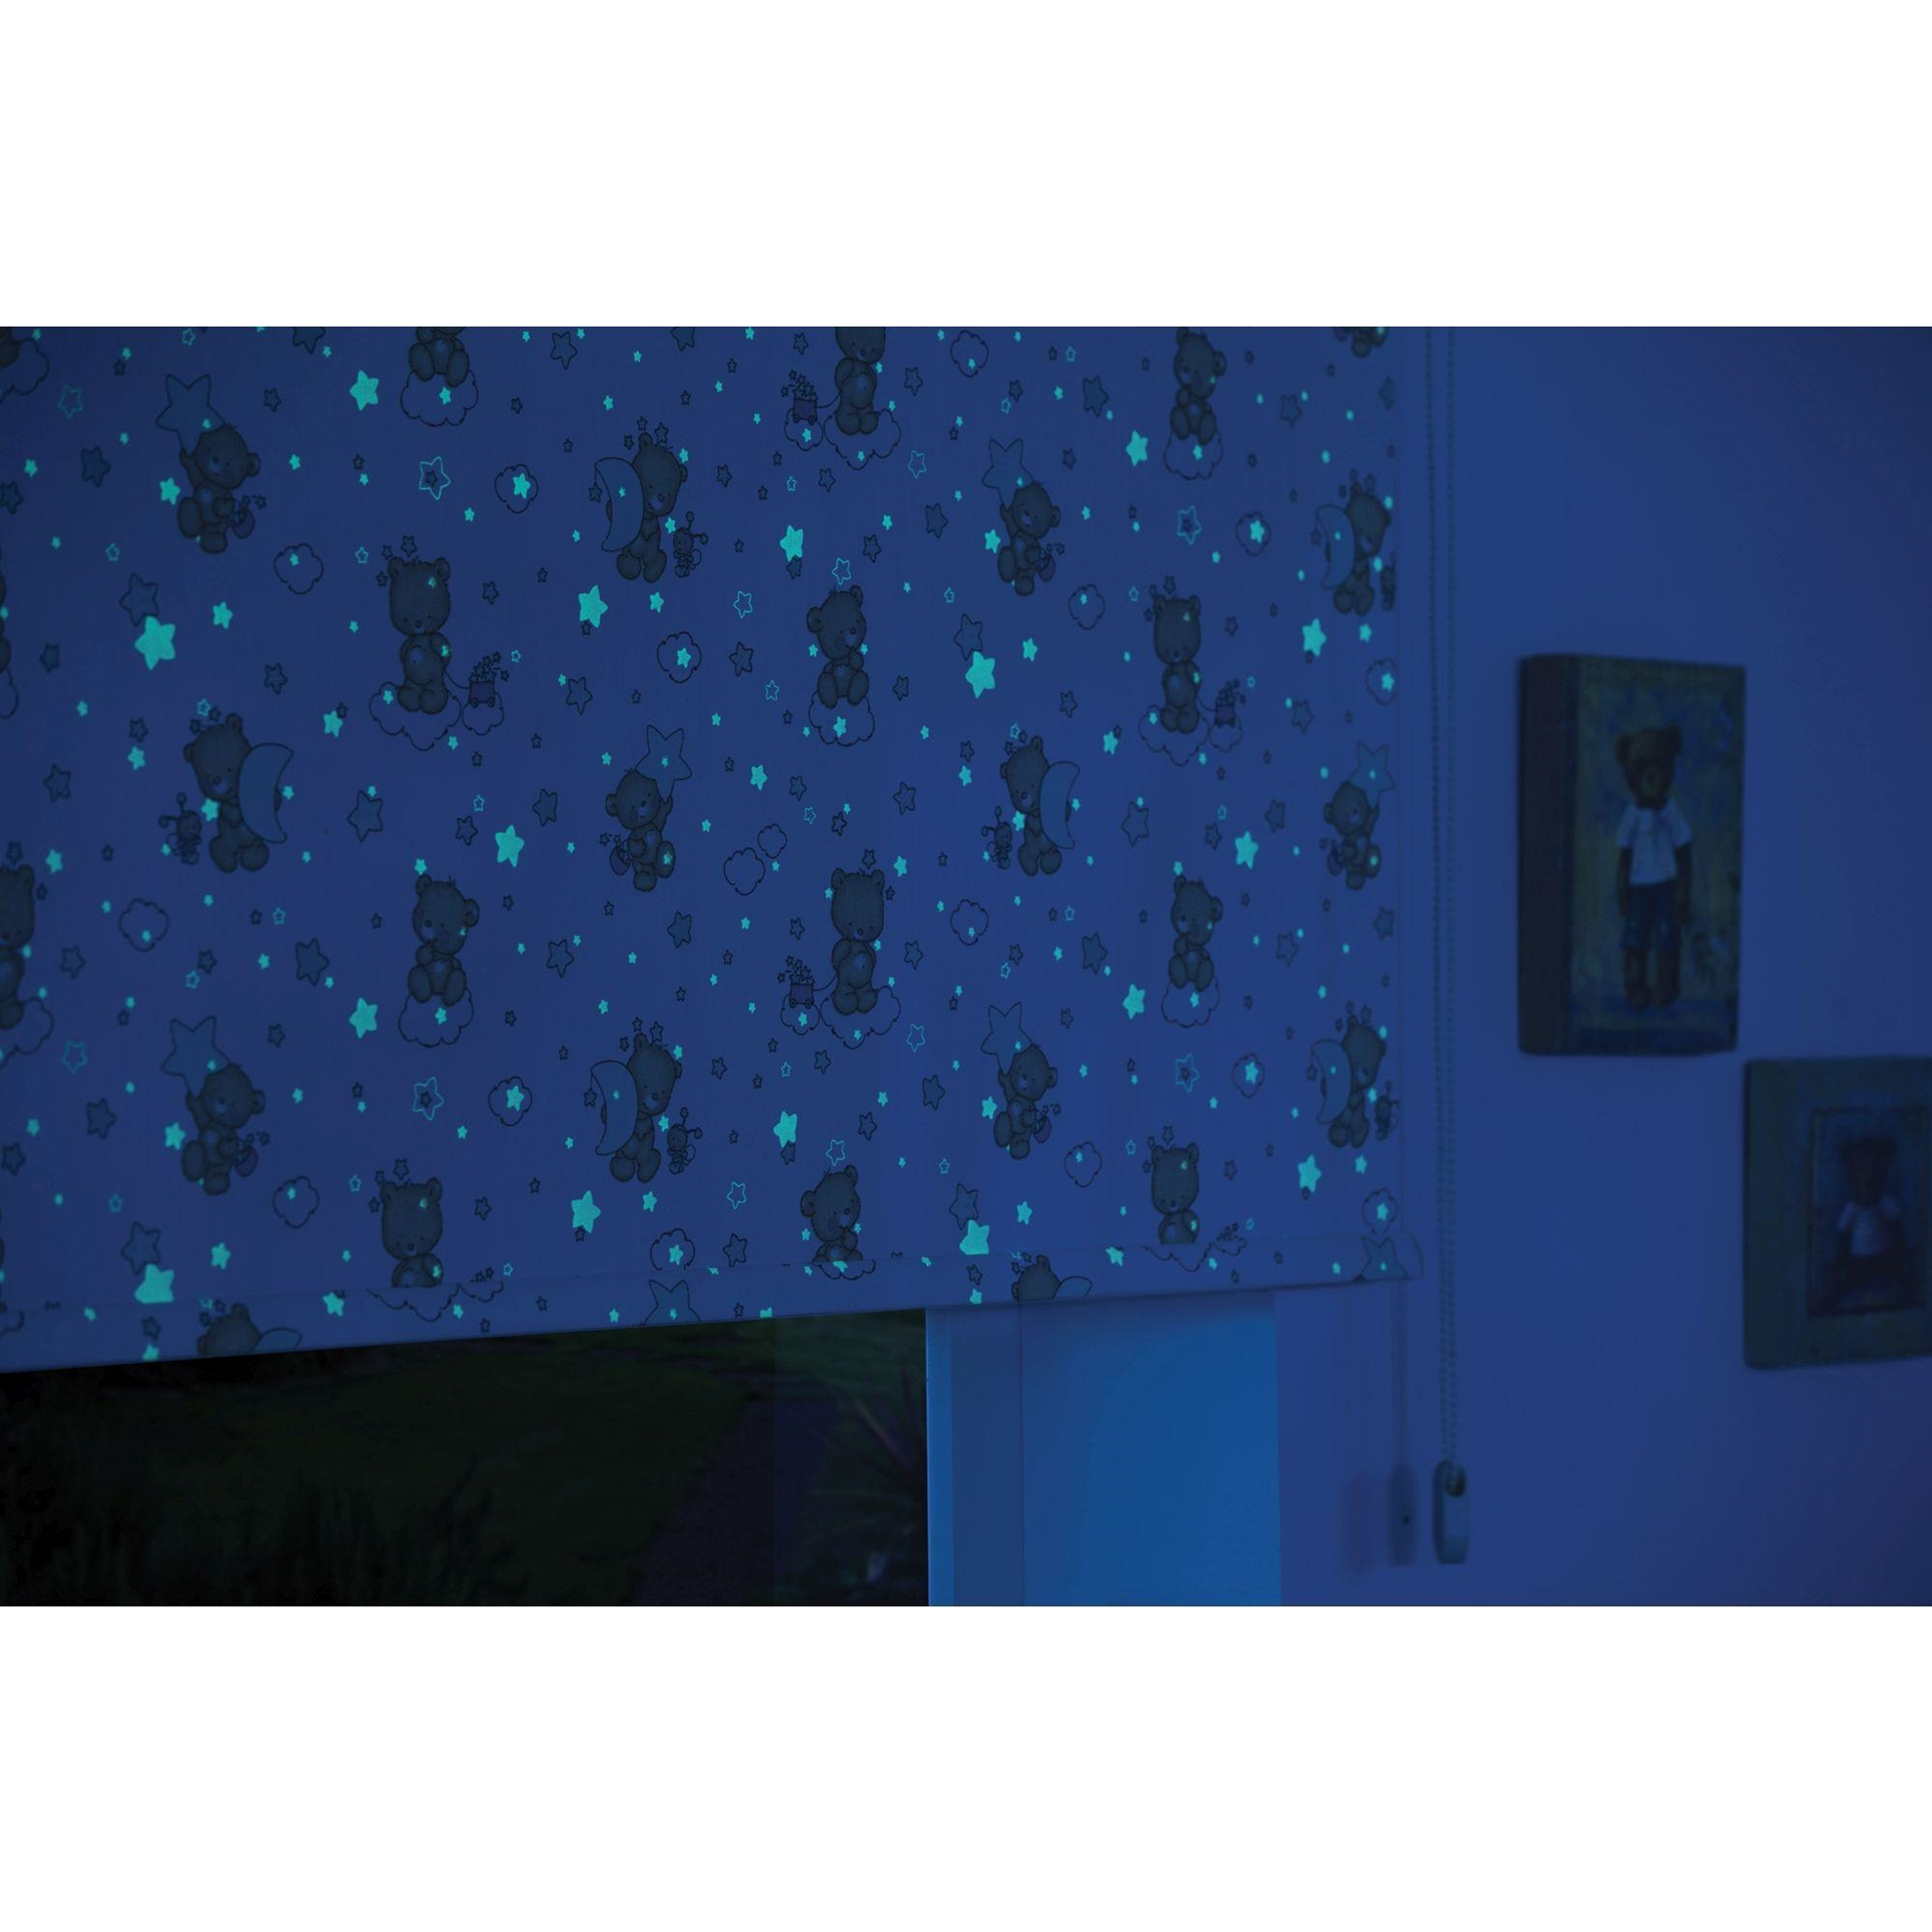 resm Taç  Ayıcık Glow Stor / 132TL (m²)